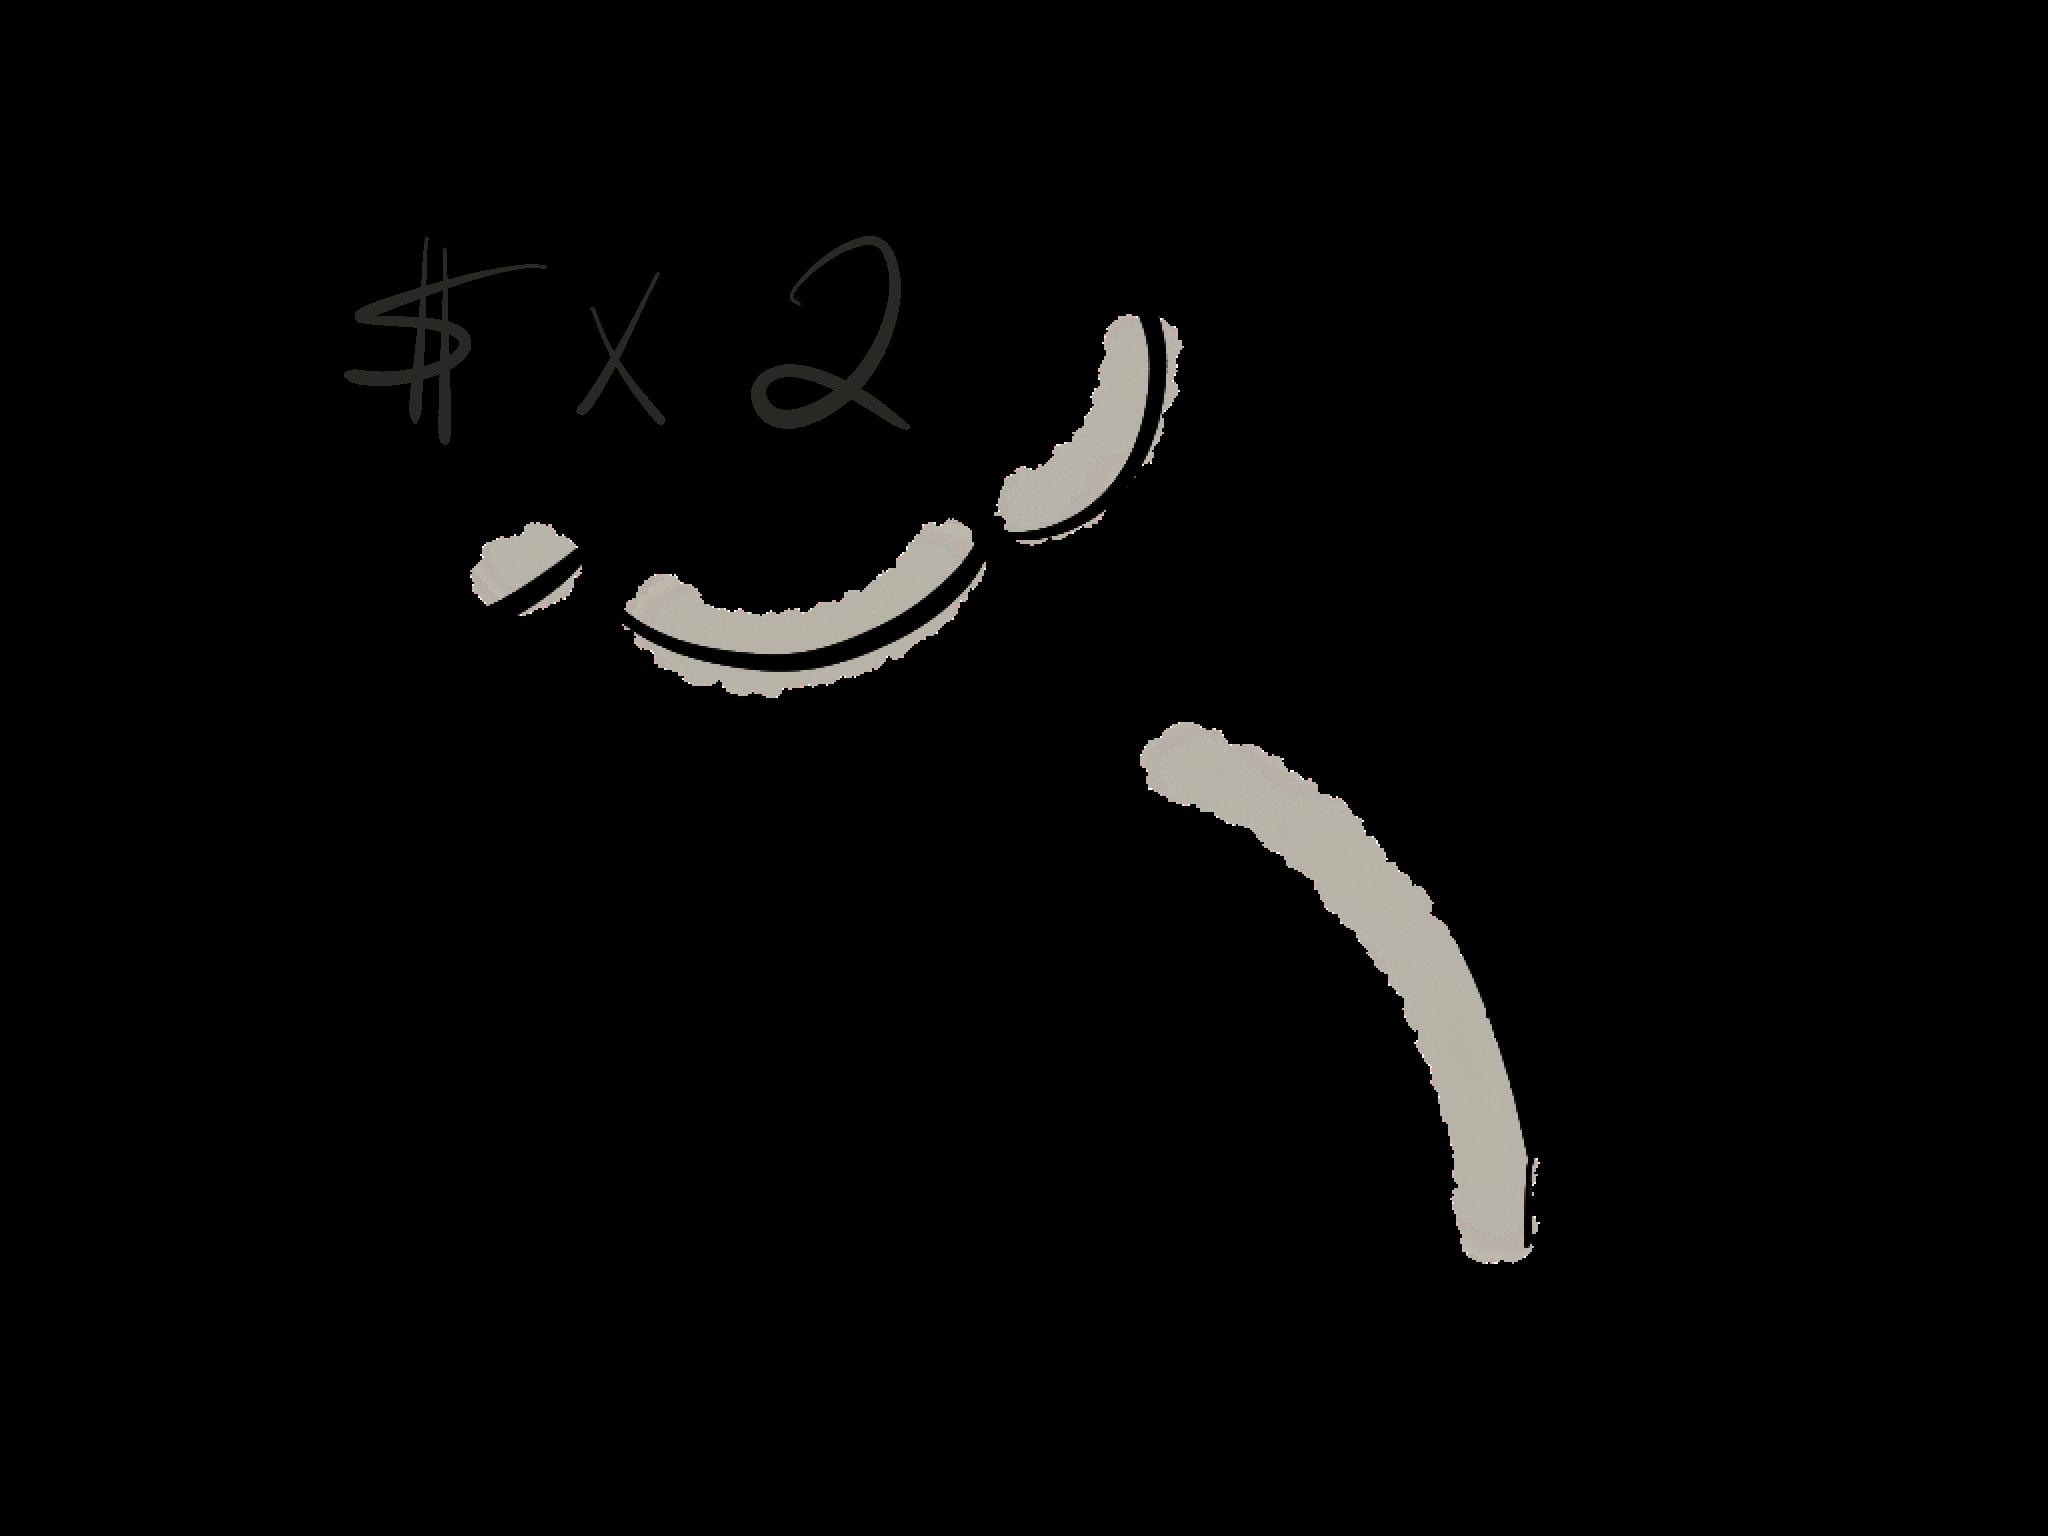 Ideasx2